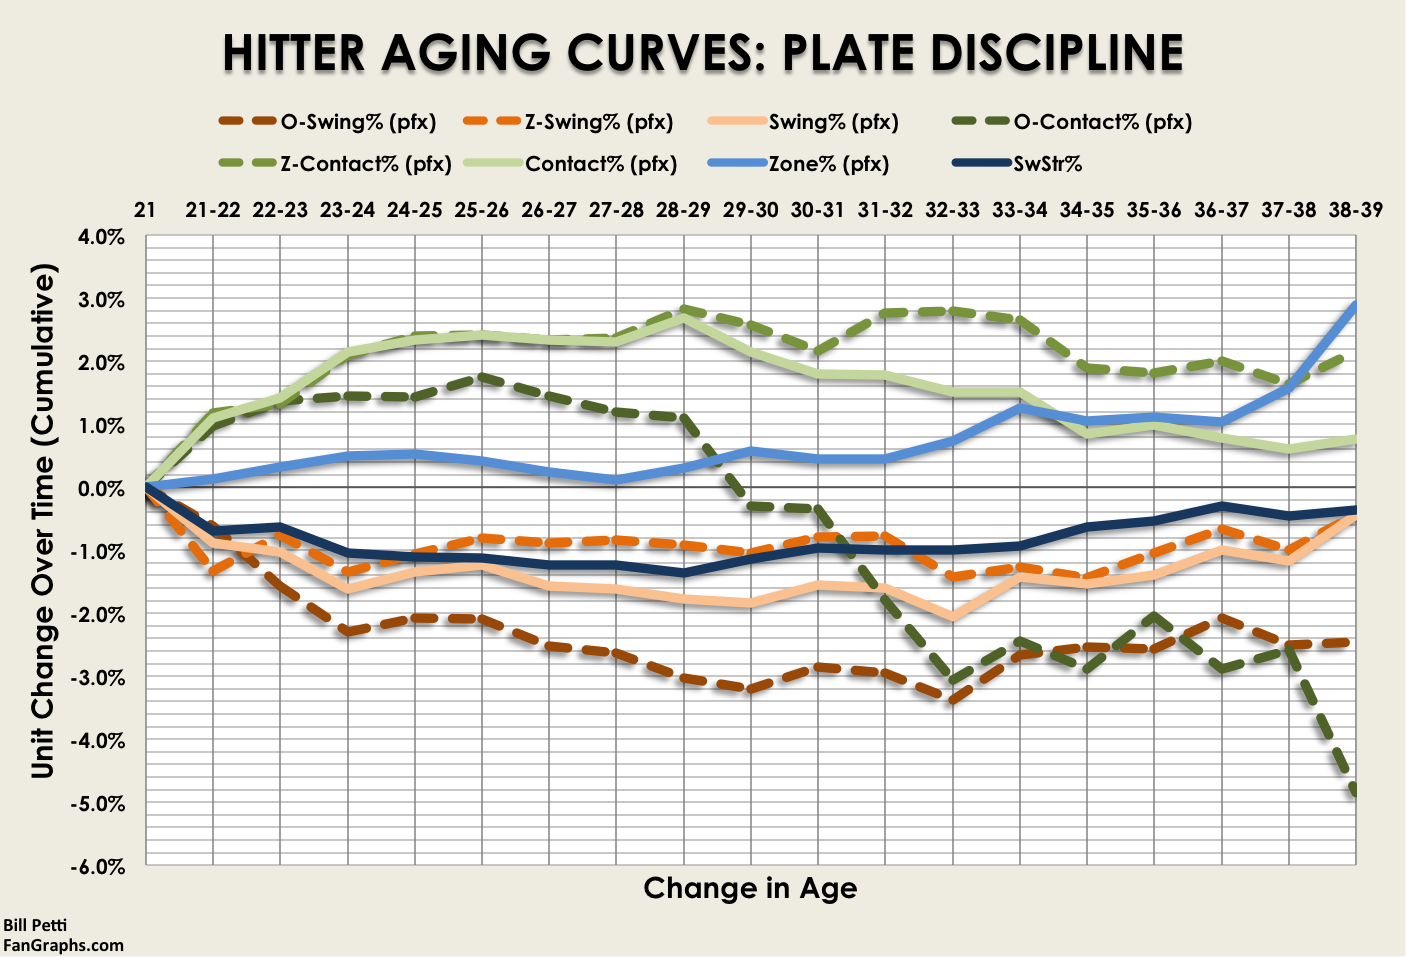 AgingCurves_Hitters_Discipline_All